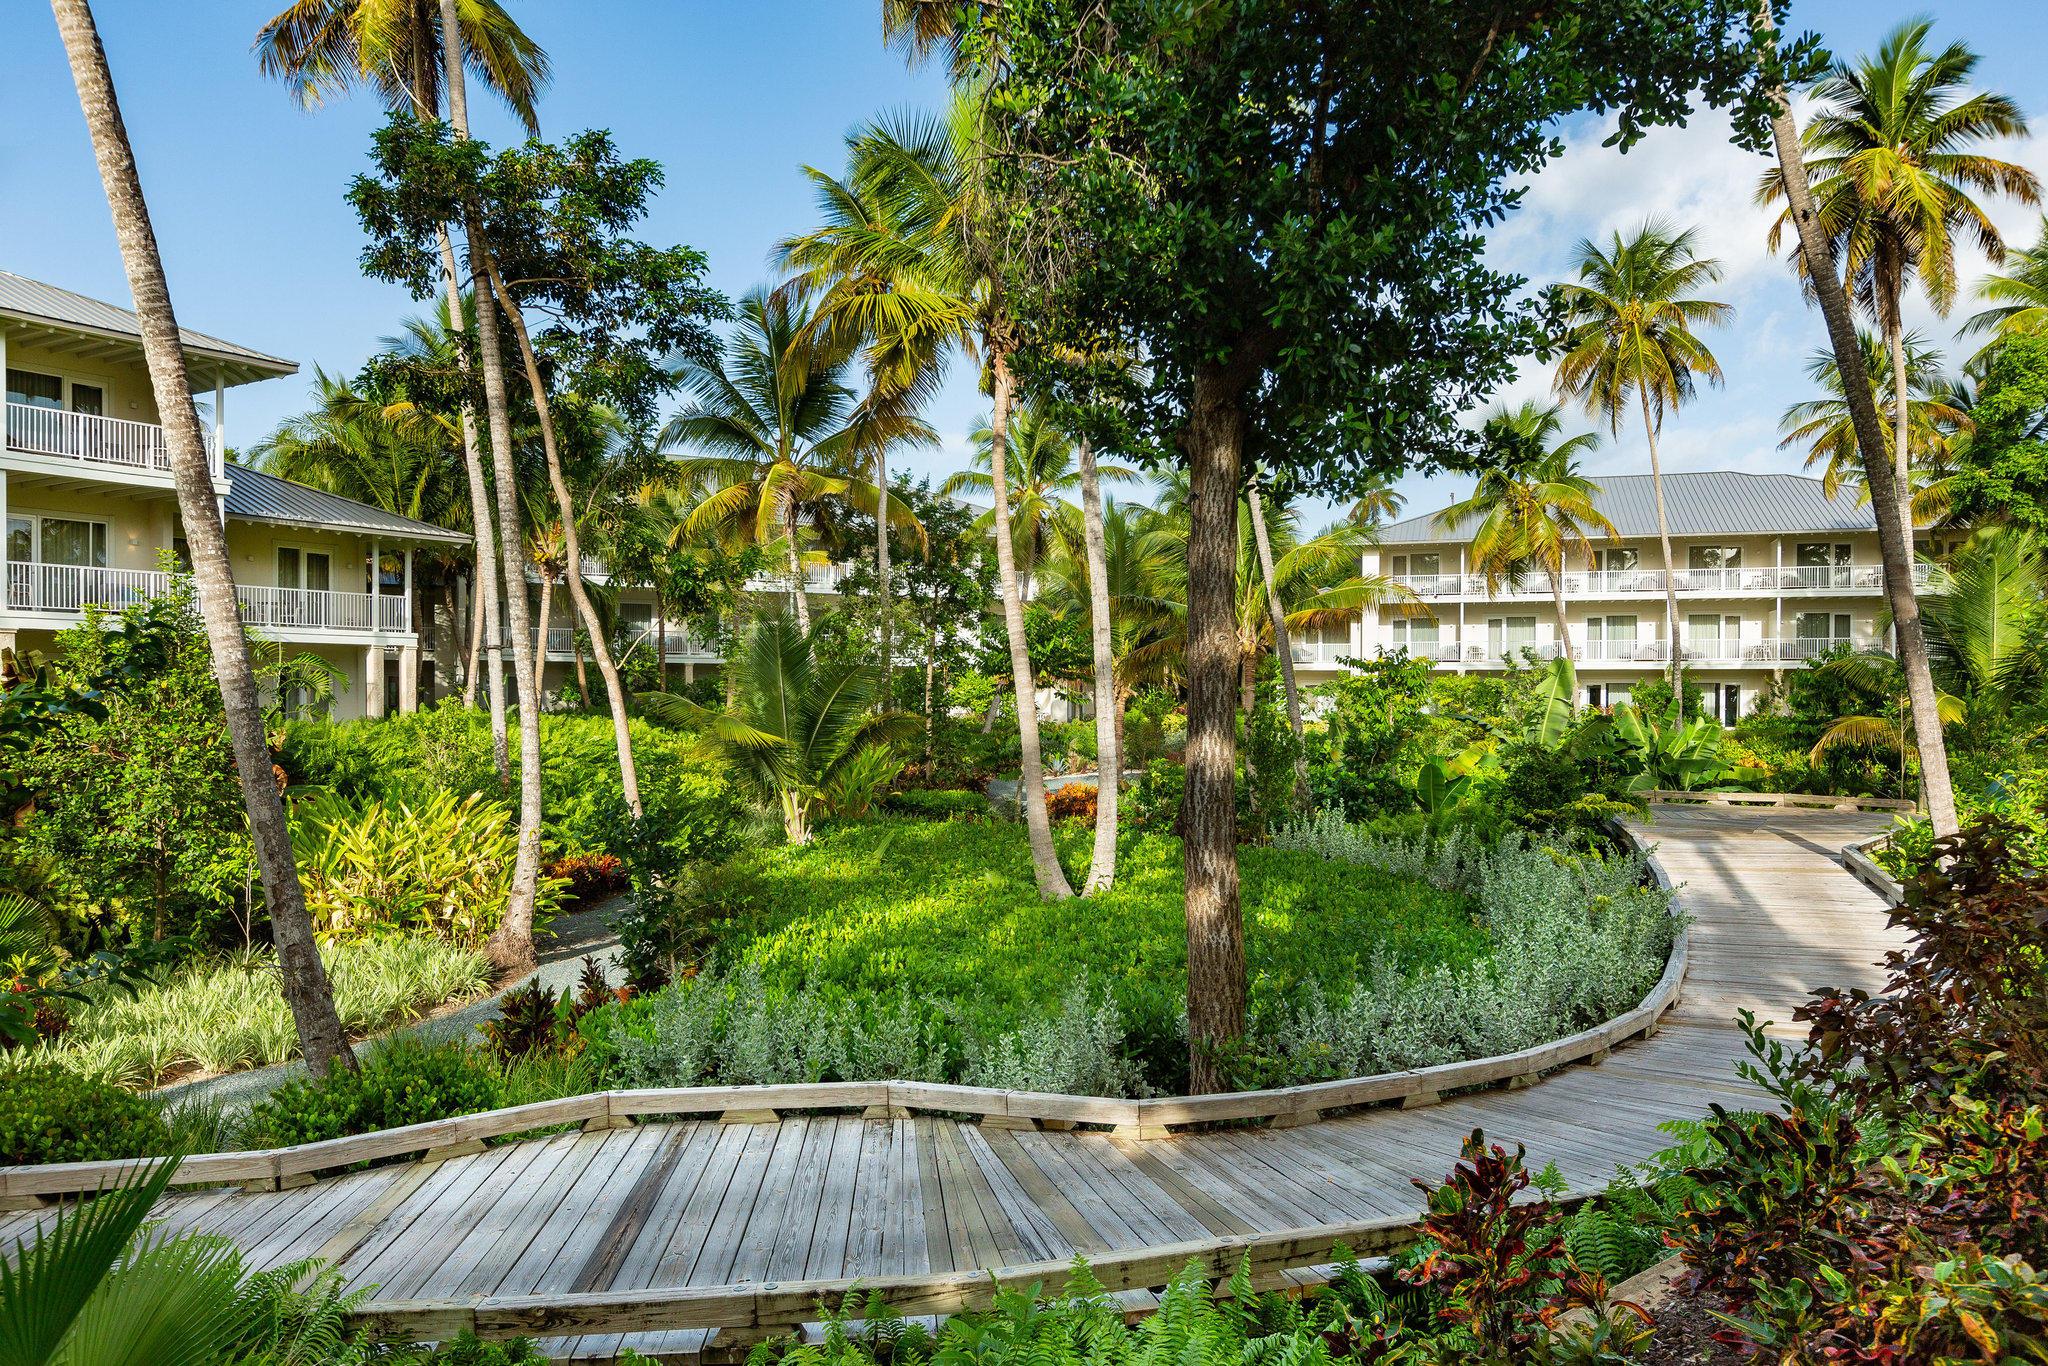 The St. Regis Bahia Beach Resort, Puerto Rico